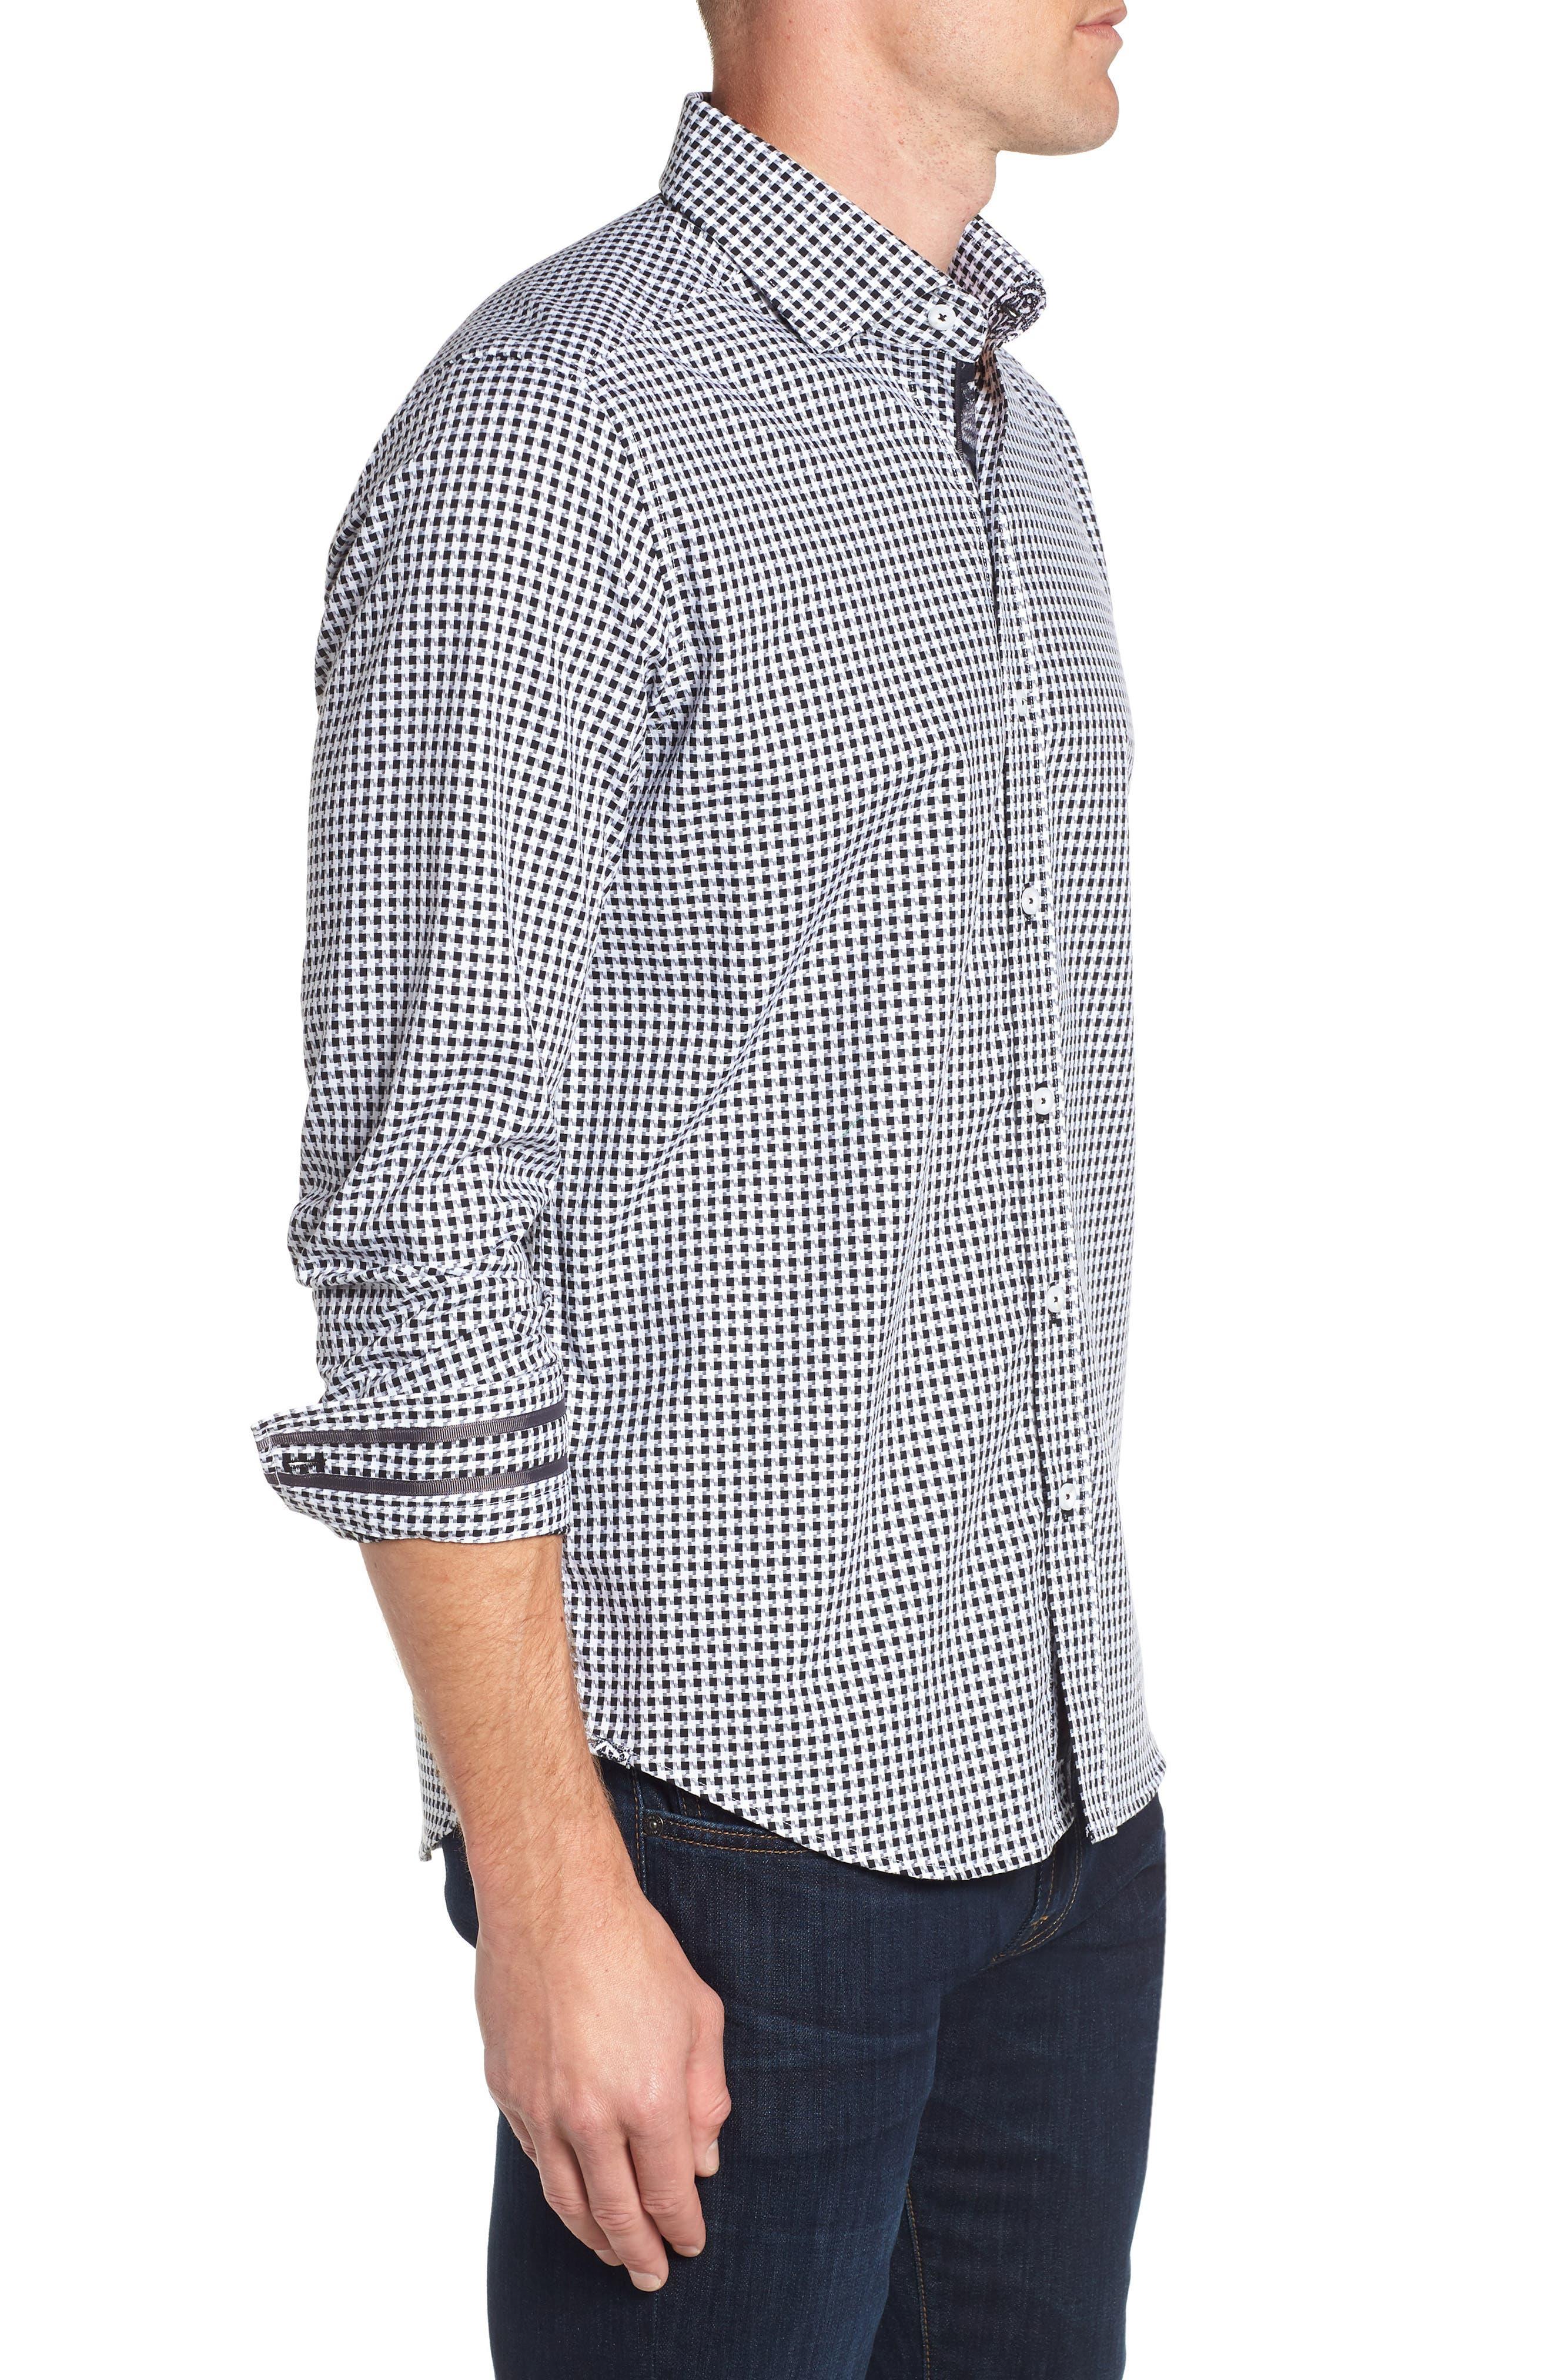 Emmett Tailored Fit Sport Shirt,                             Alternate thumbnail 4, color,                             BLACK